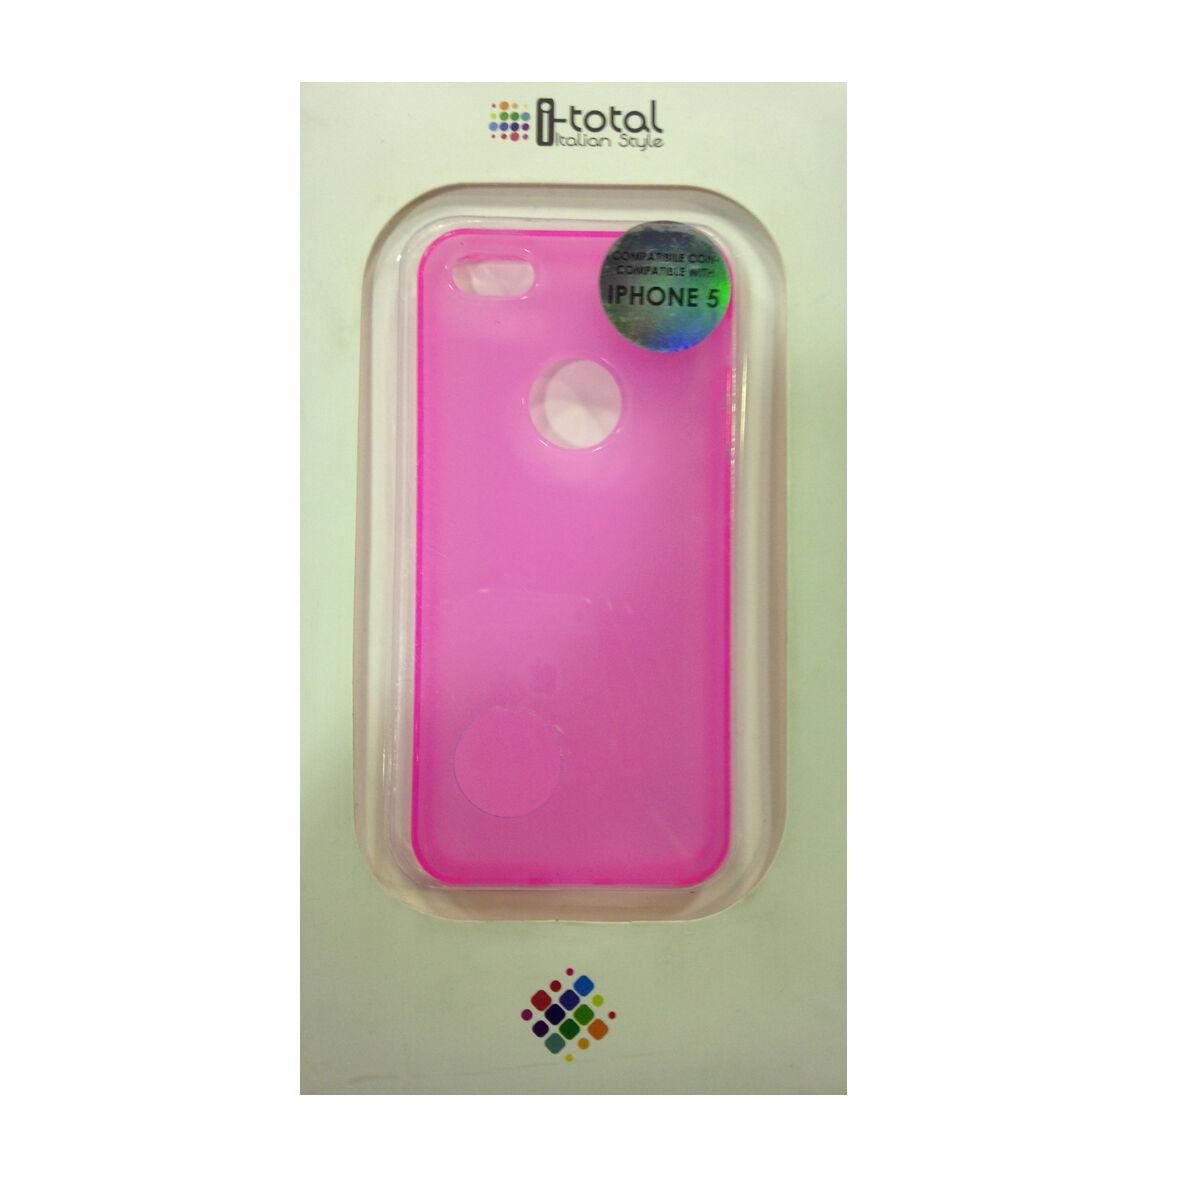 COVER mascherine iphone 5/5S rosa fluo in silicone TPU liscio I-TOTAL